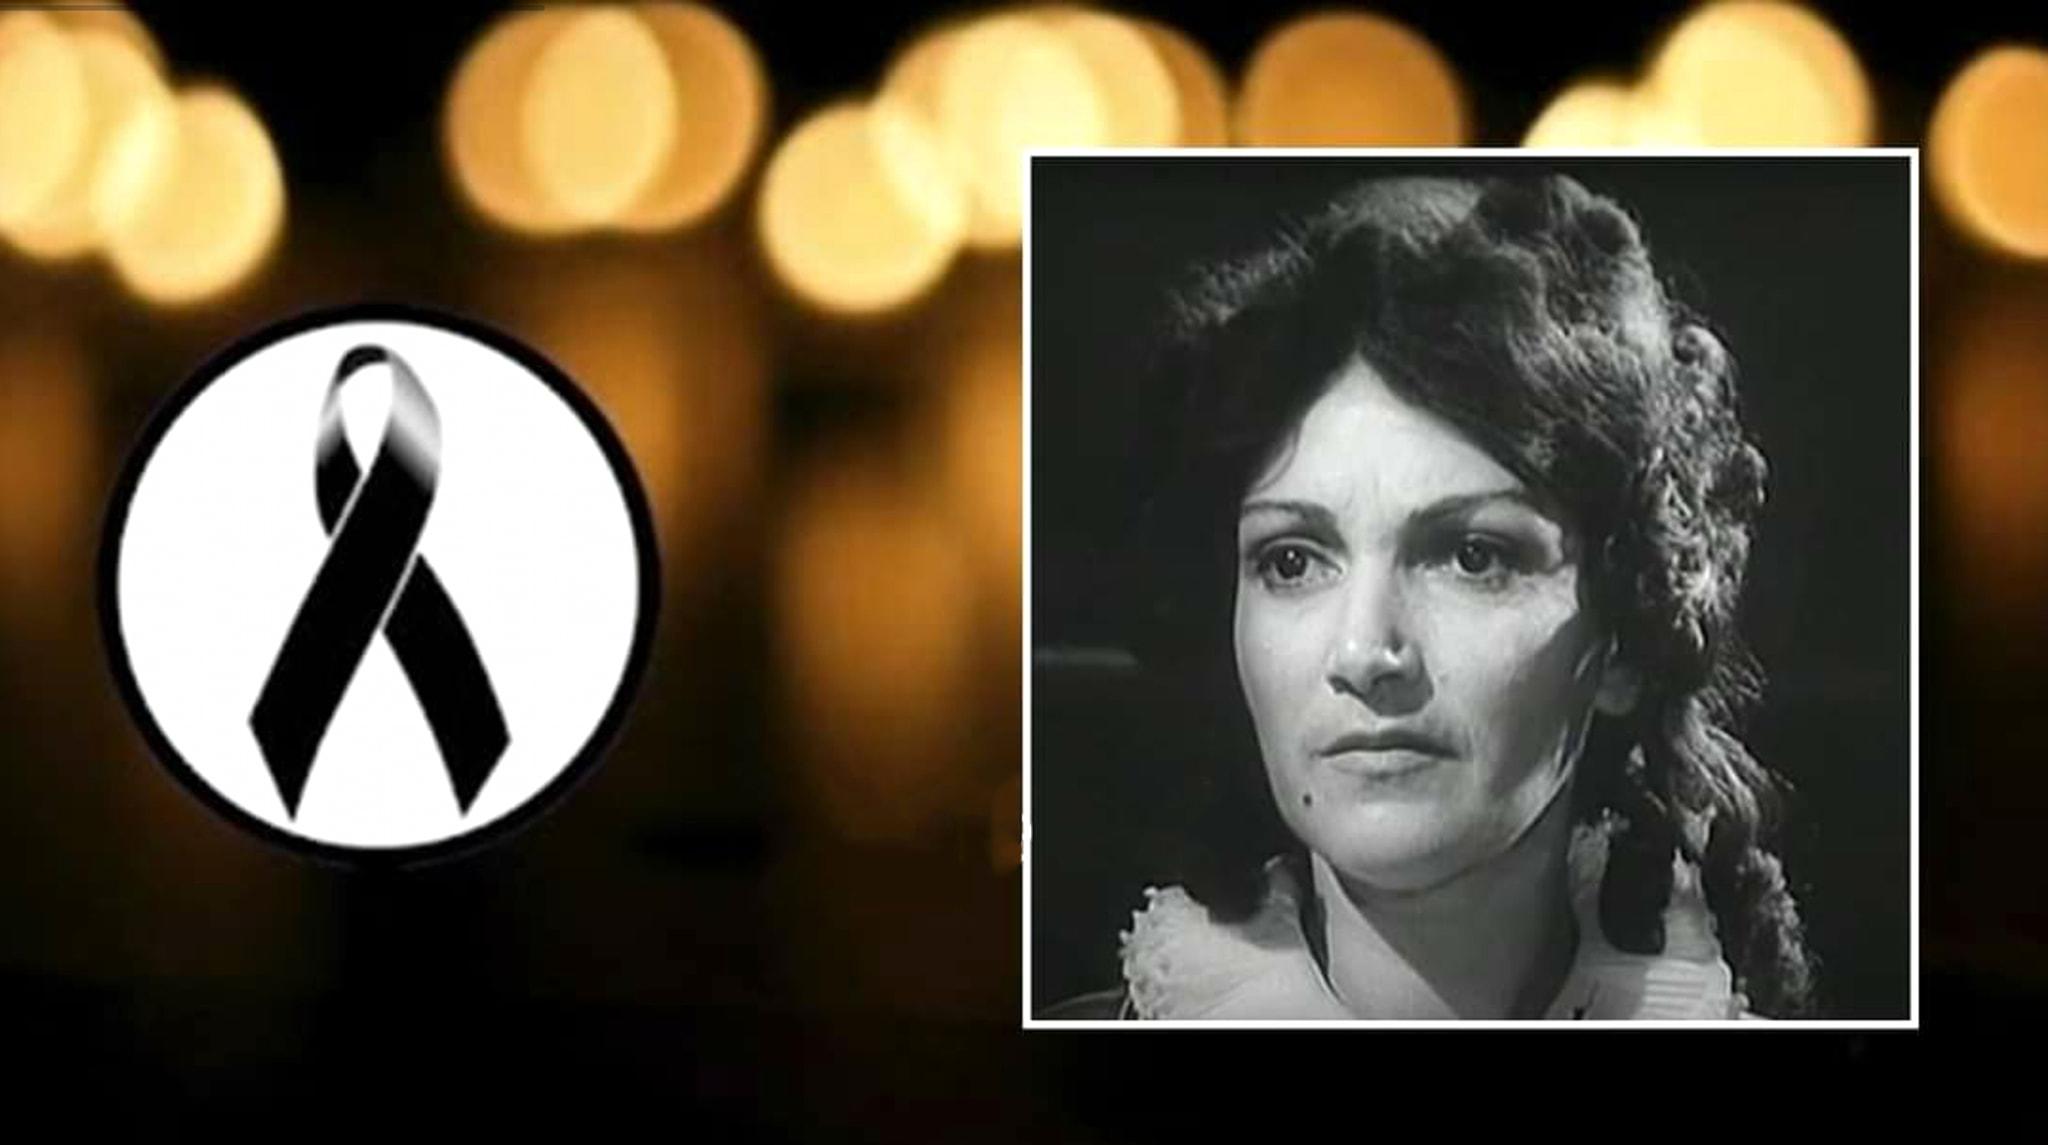 Ndahet nga jeta aktorja durrsake, Filika Dimo